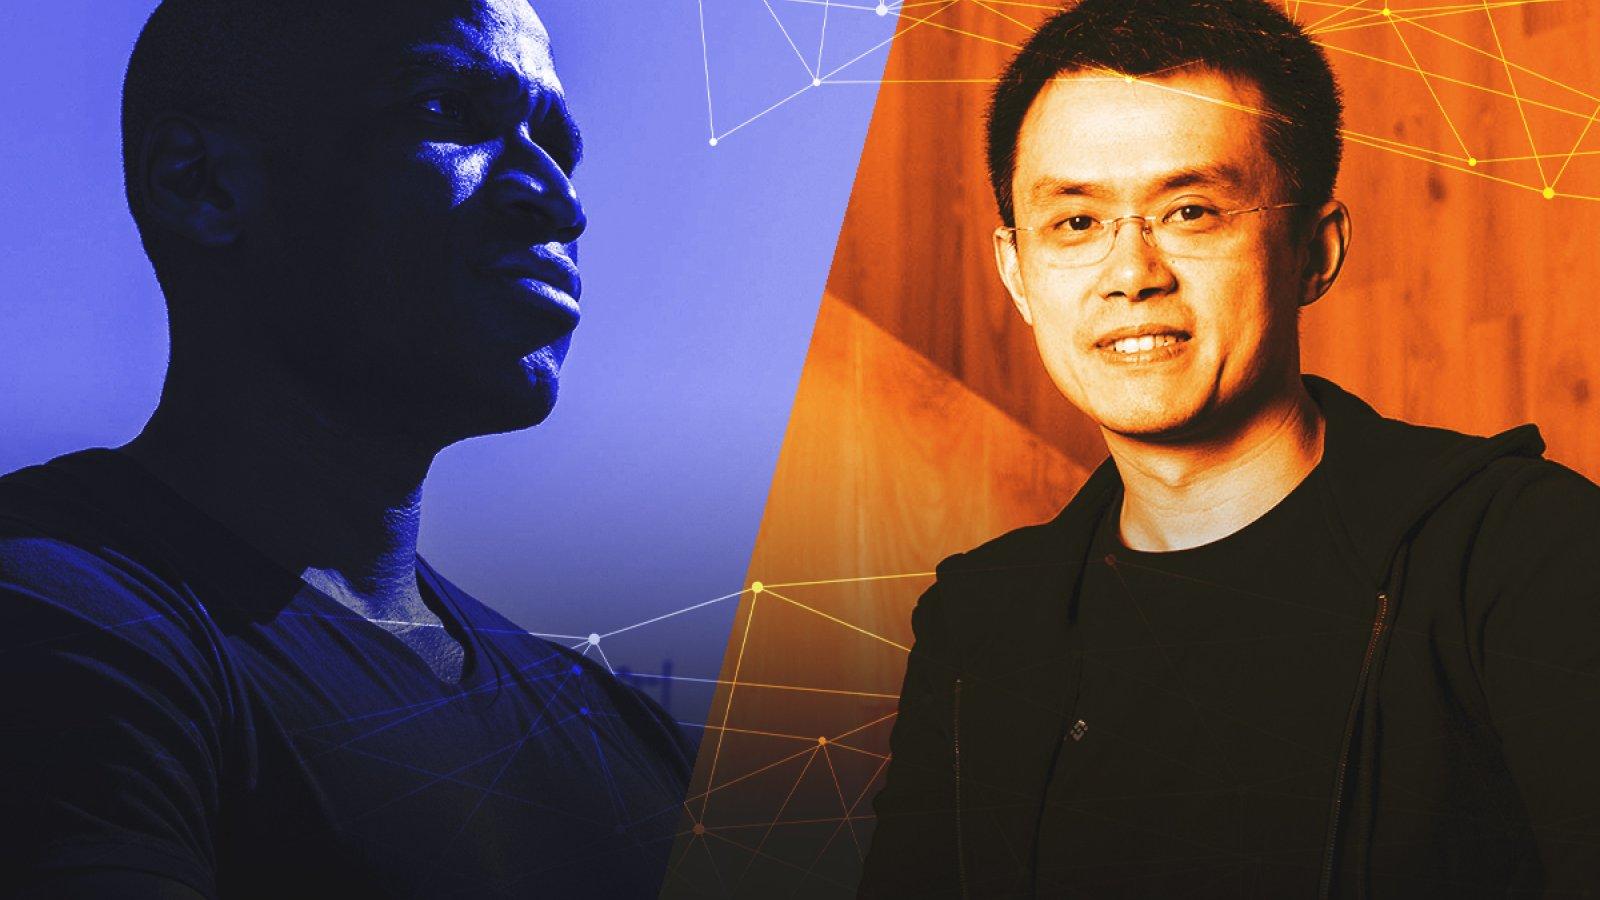 BitMEX Accuses Binance of Plagiarism, Changpeng Zhao Posts